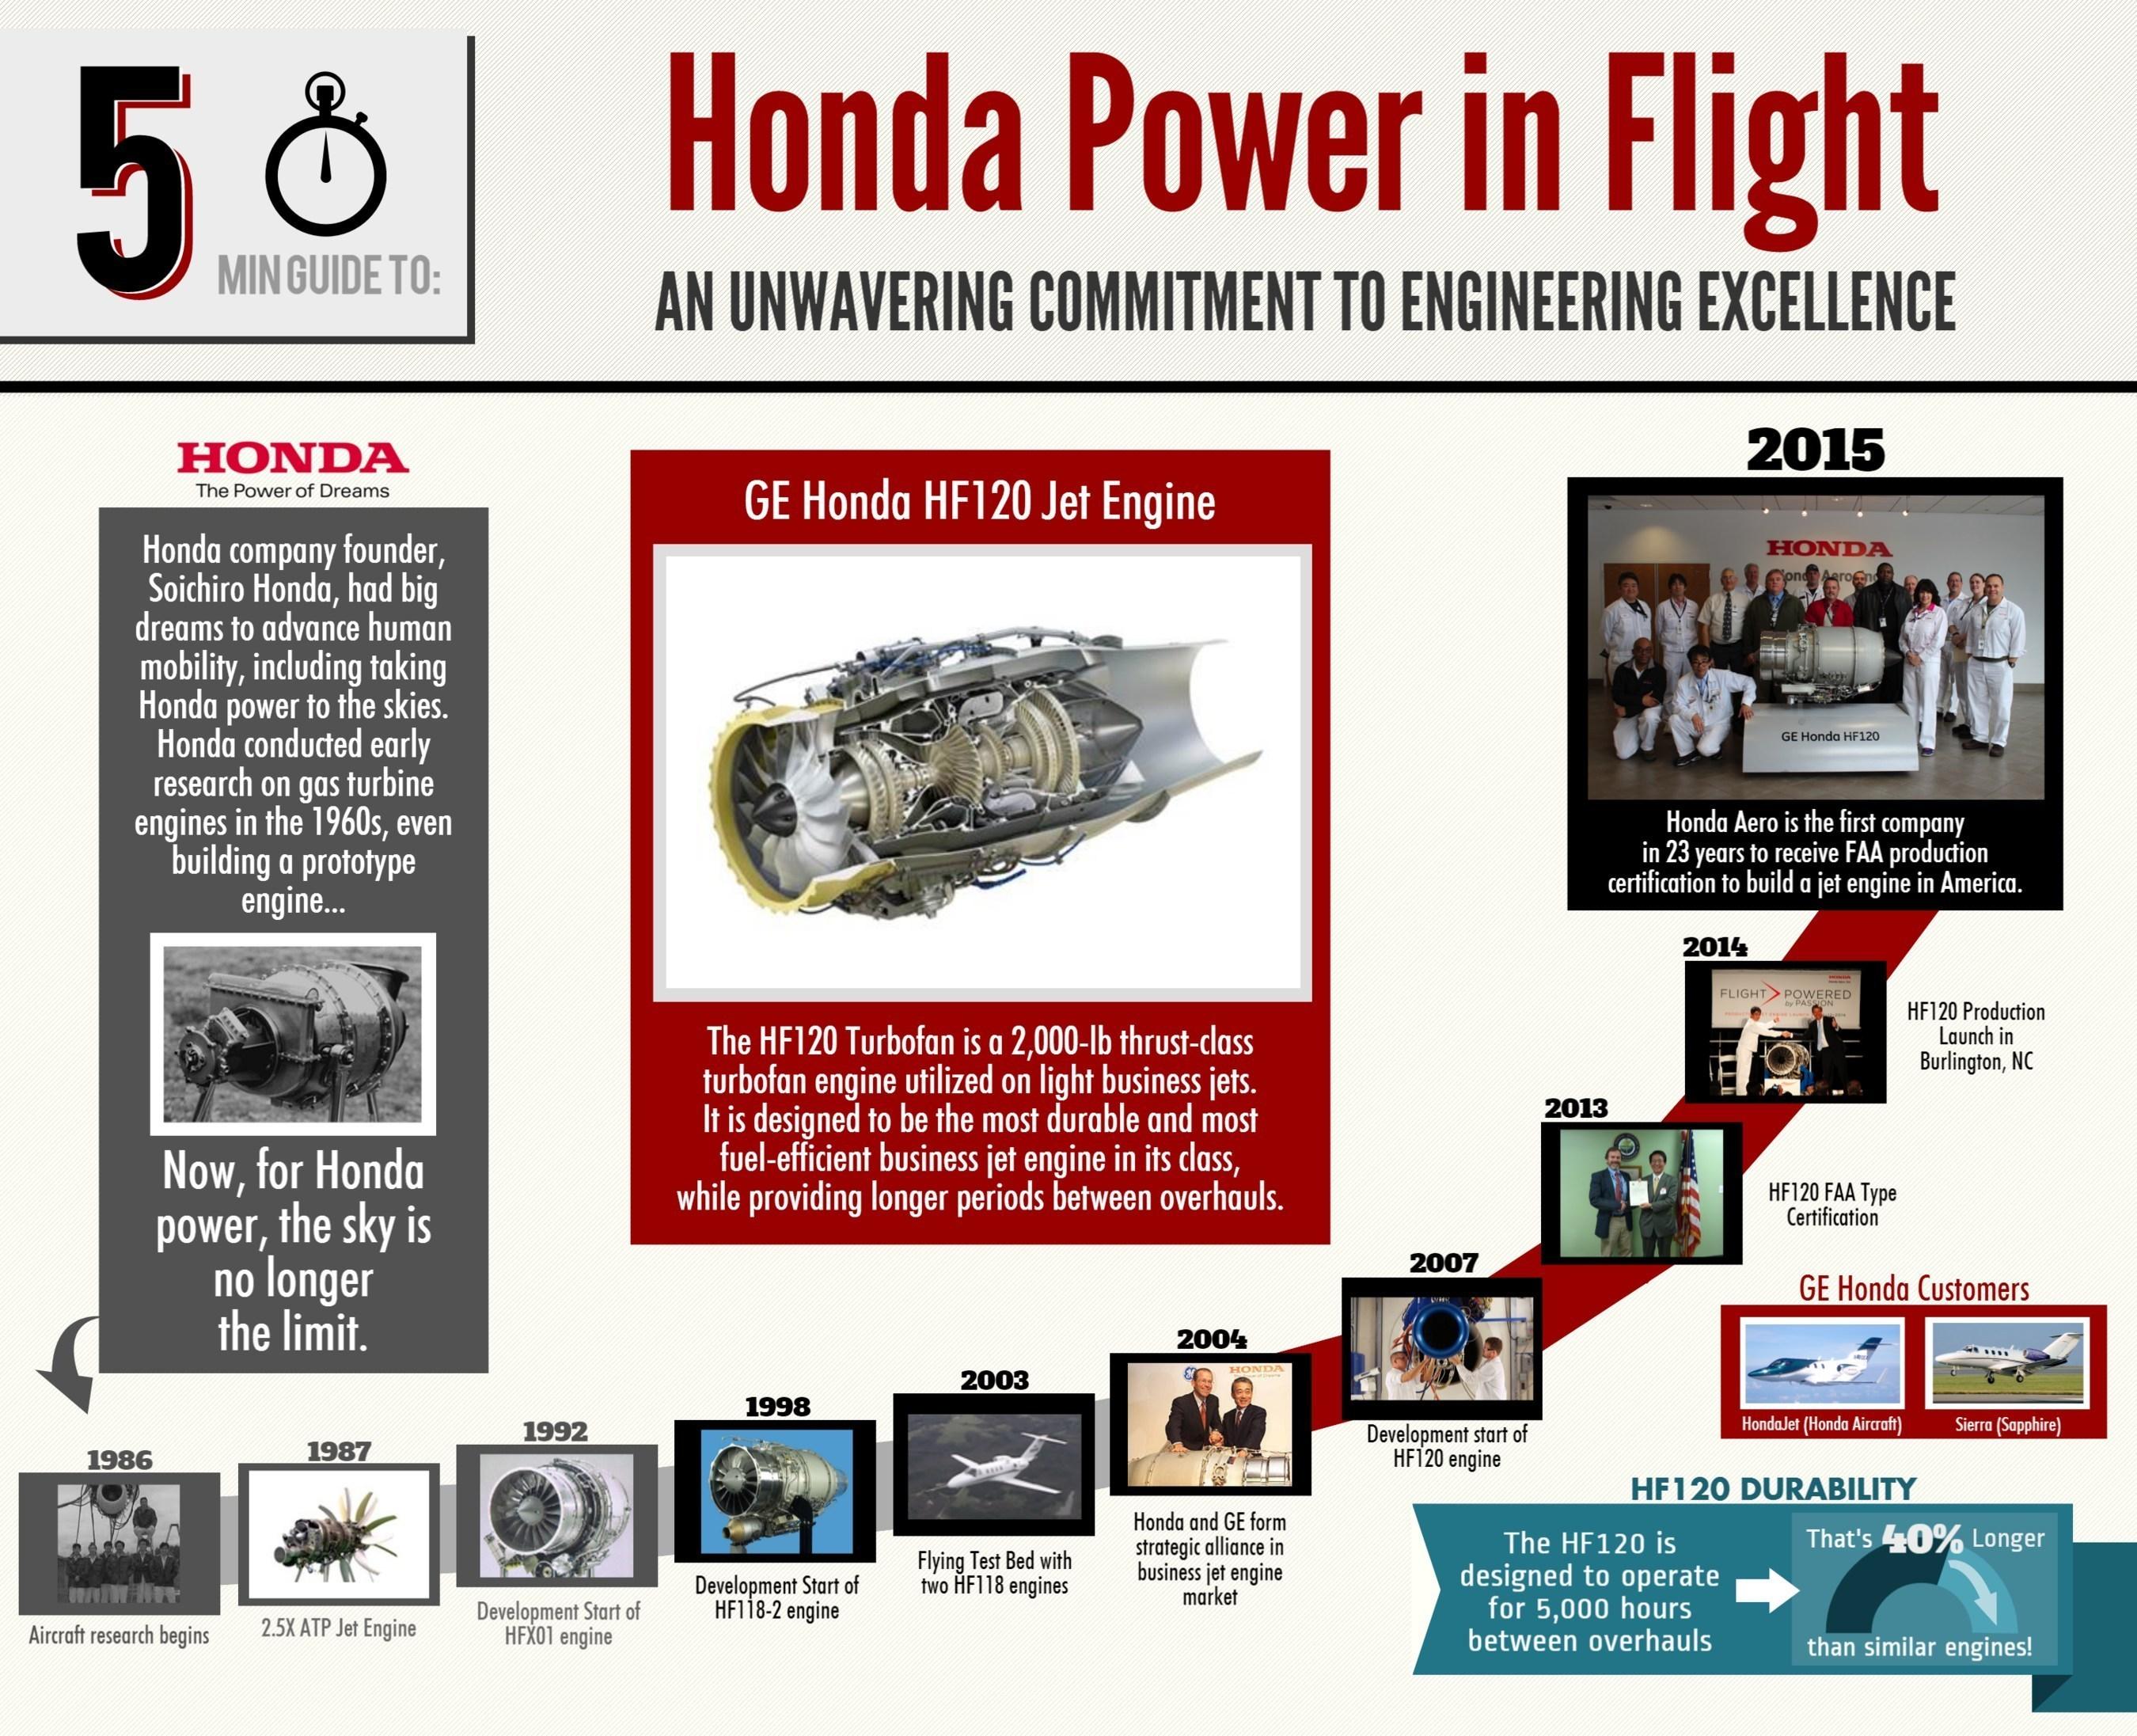 Honda Power in Flight Infographic